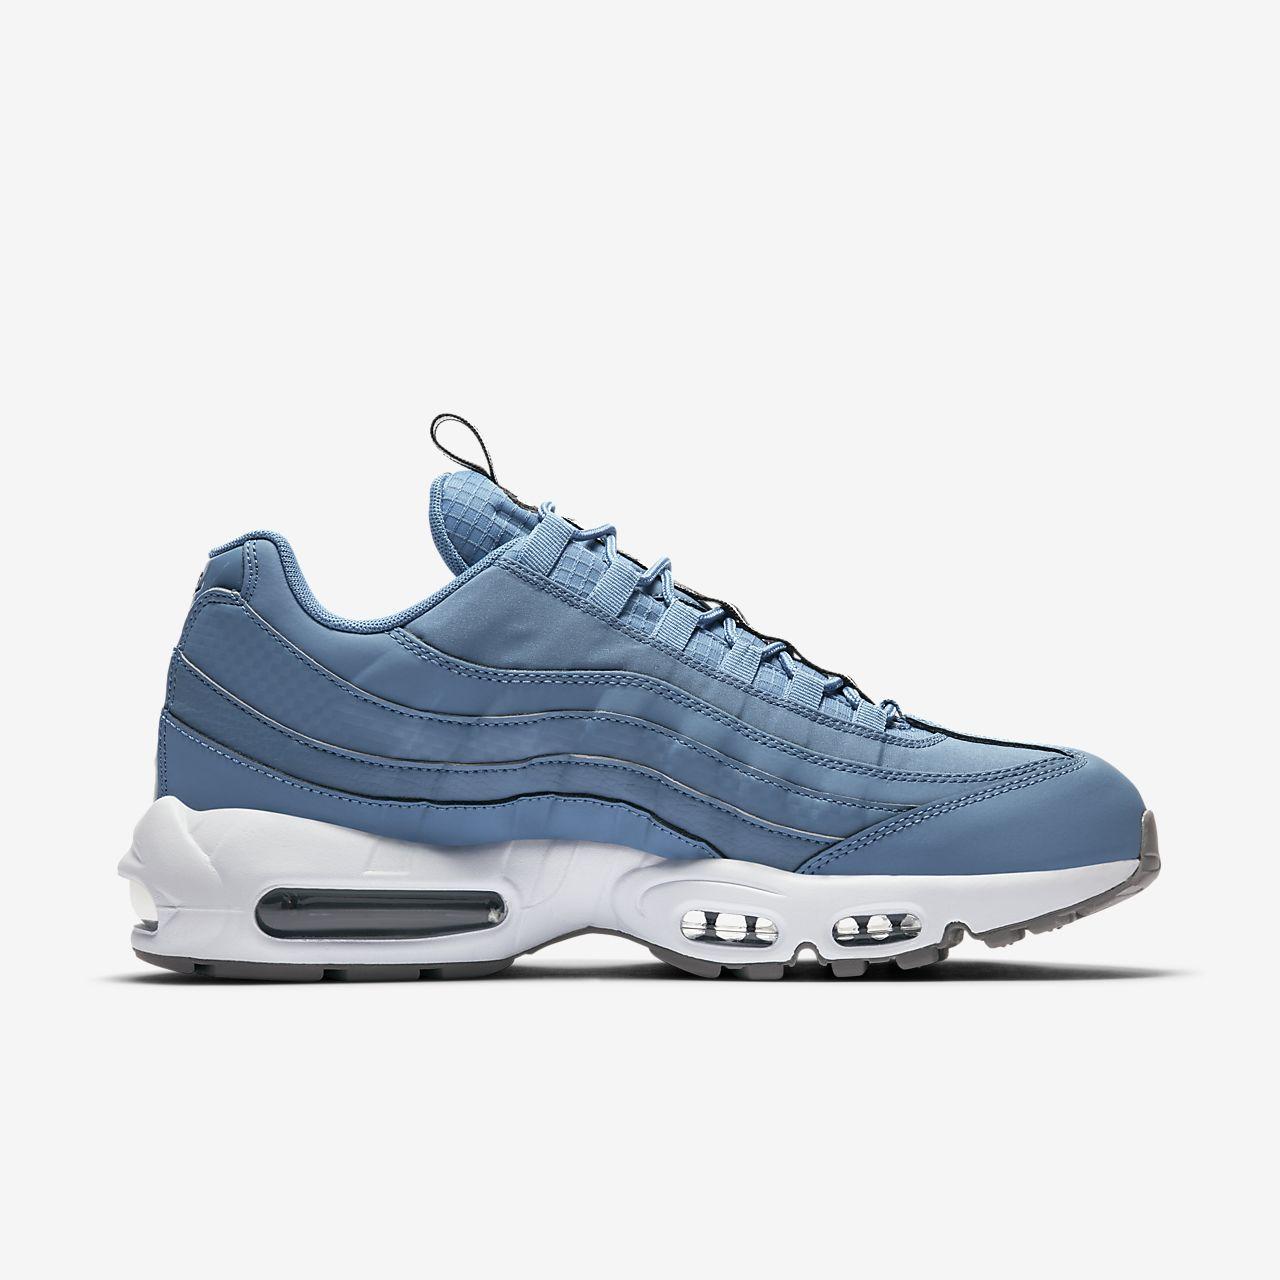 scarpe uomo nike 2018 air max 95